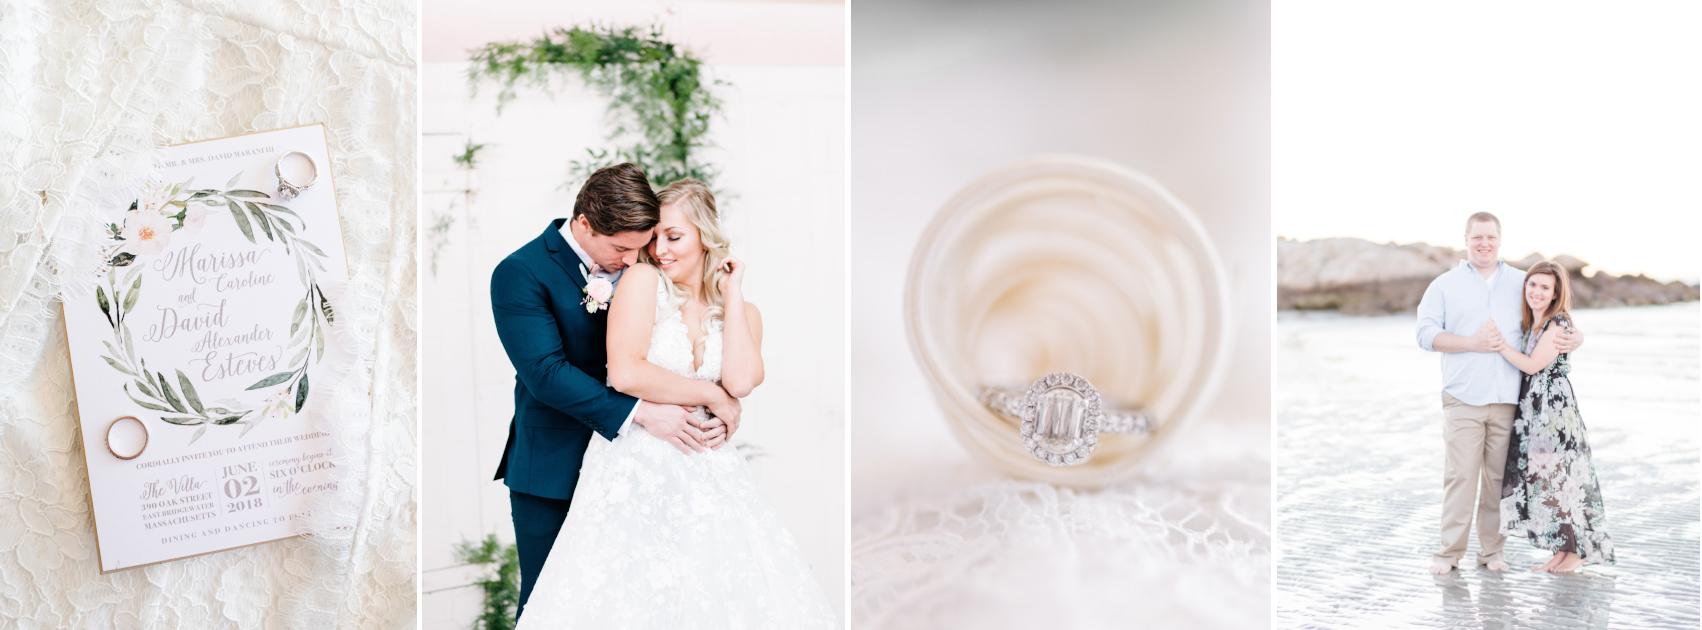 eisley-images-rhode-island-wedding.jpg